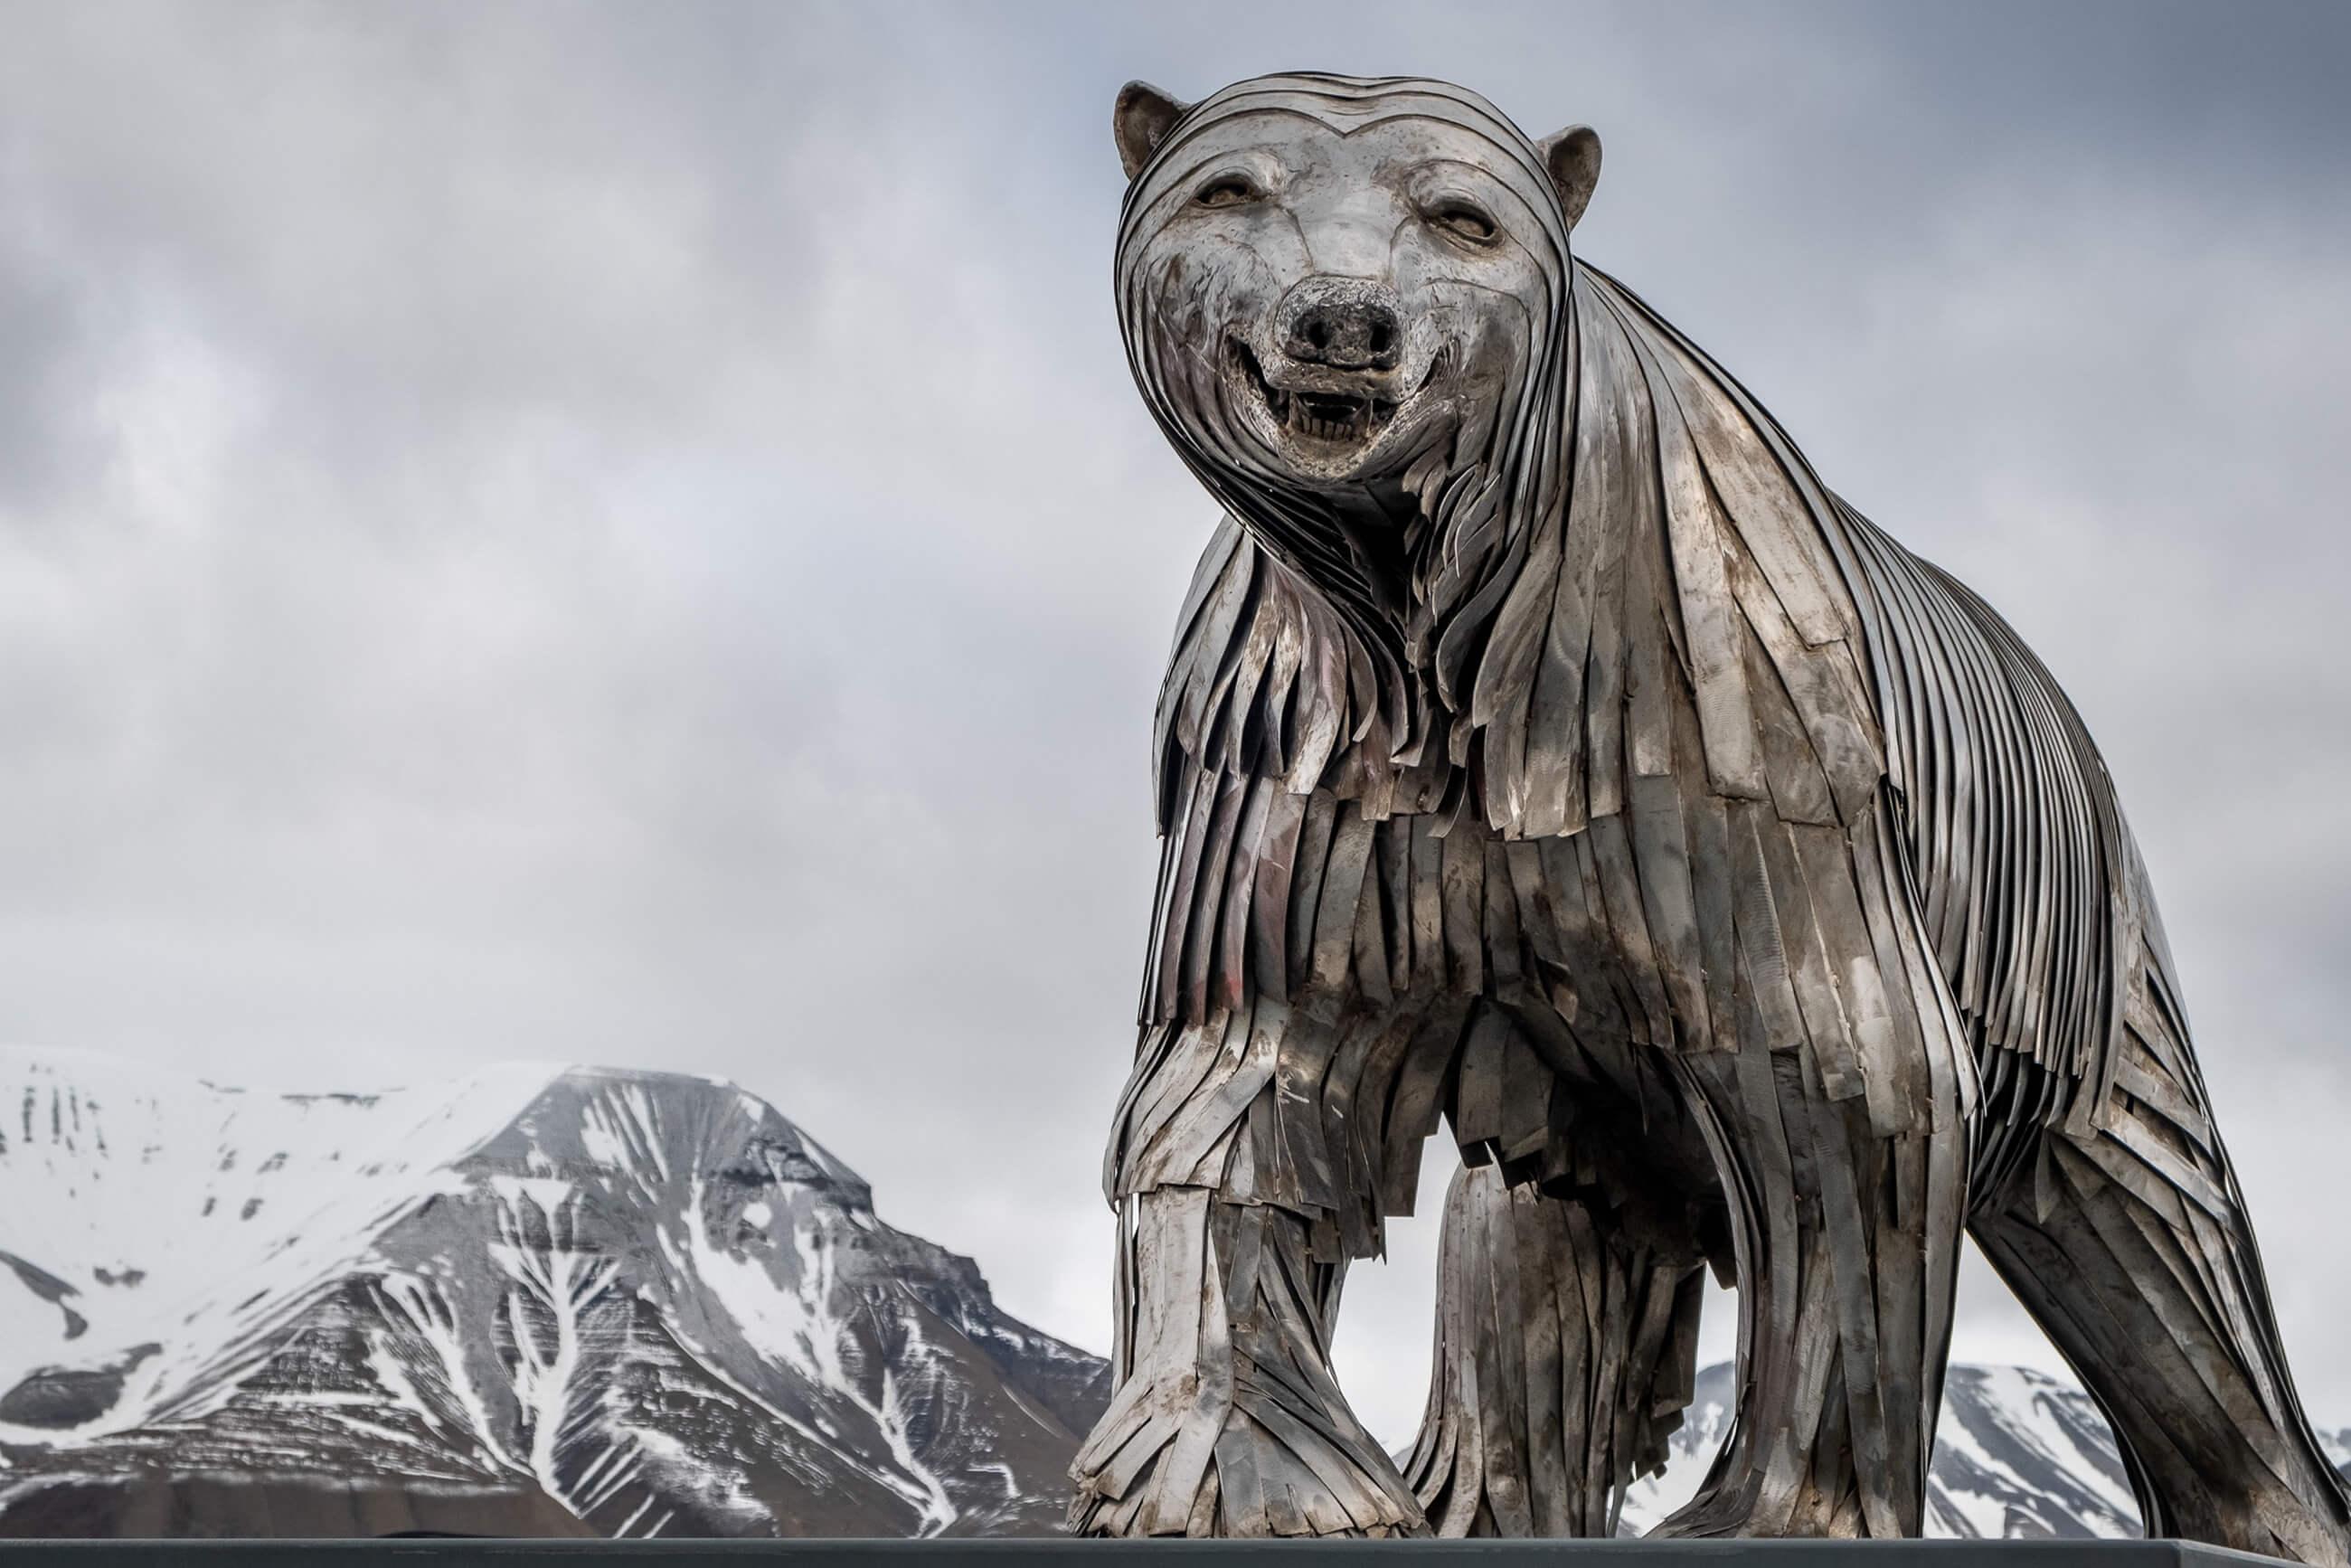 https://bubo.sk/uploads/galleries/7362/polar-bear-statue-longyearbyen-svalbard-hgr-136927--photo_andrea_klaussner-47.jpg